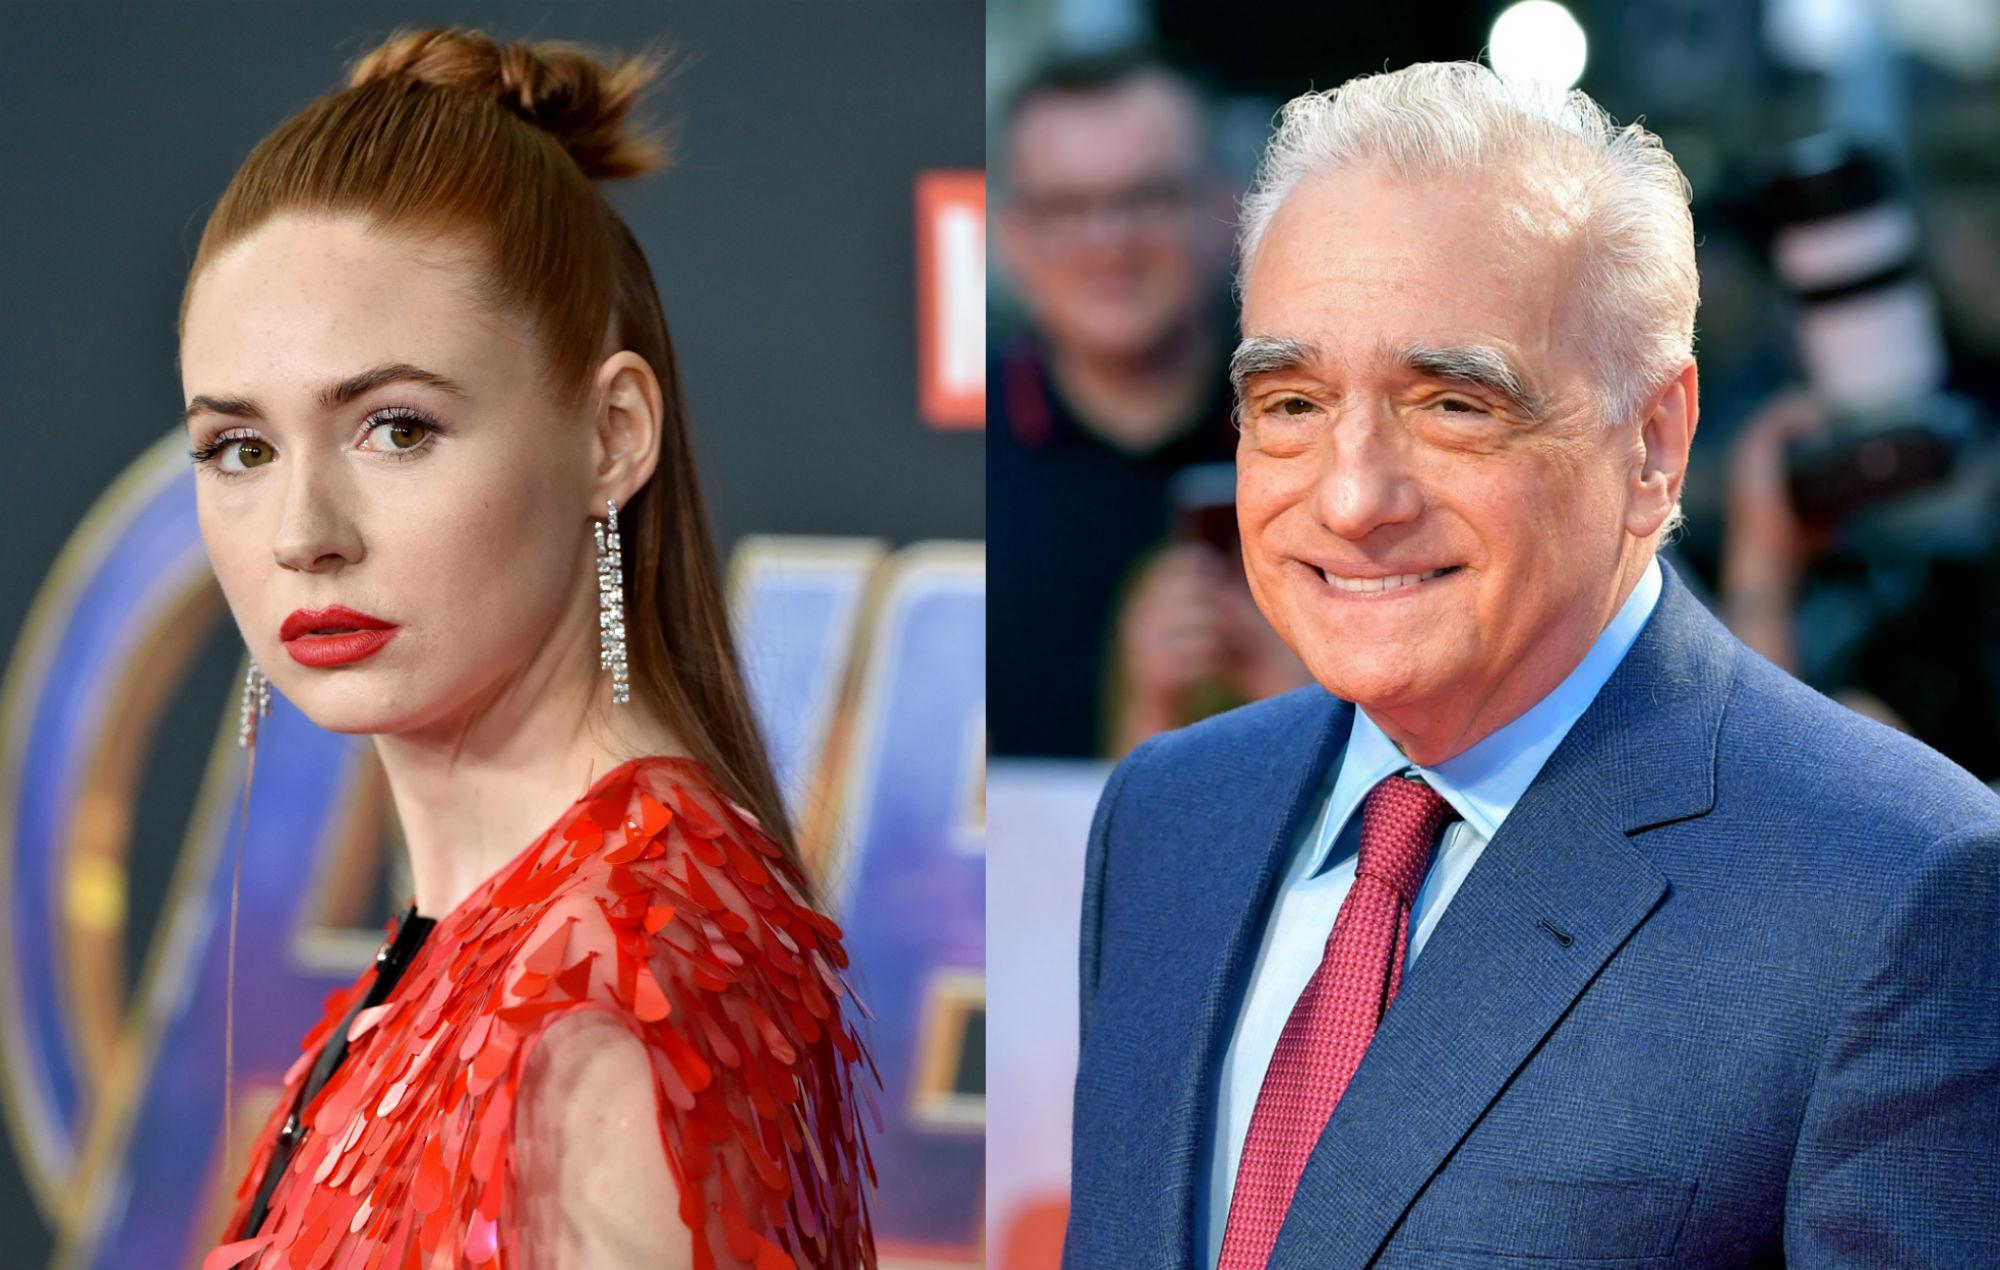 Karen Gillan defends Marvel movies against Martin Scorsese comments